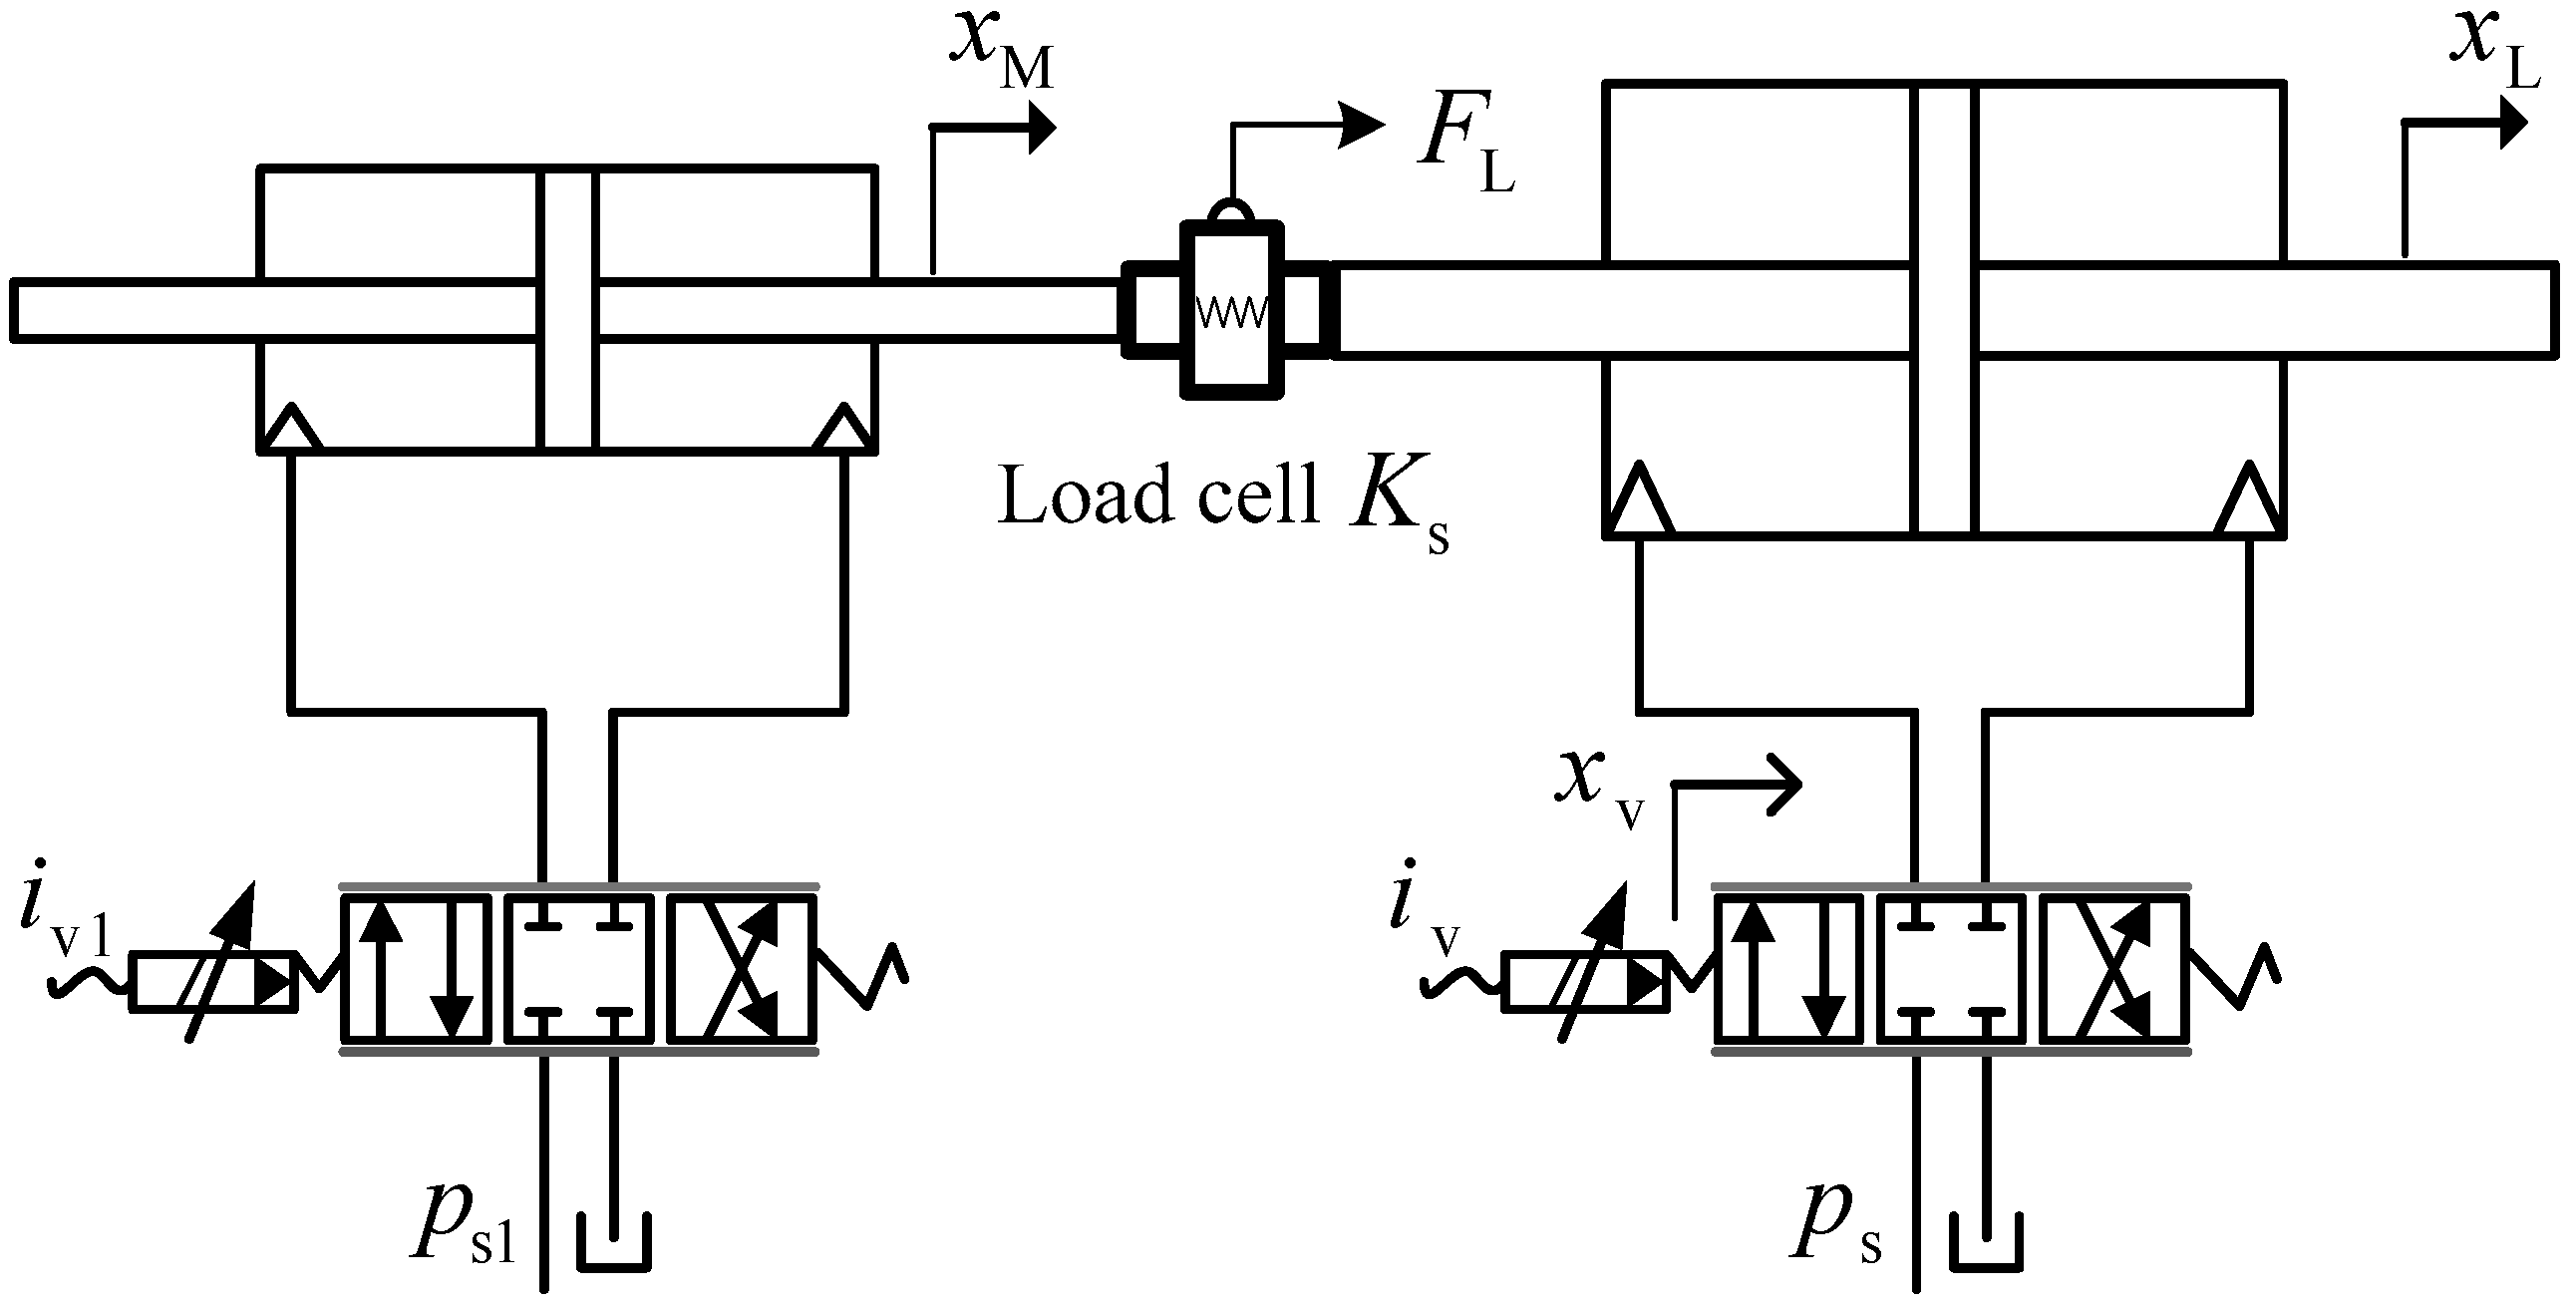 [DIAGRAM] 1525 Bl Servo Amplifier Wiring Diagram FULL